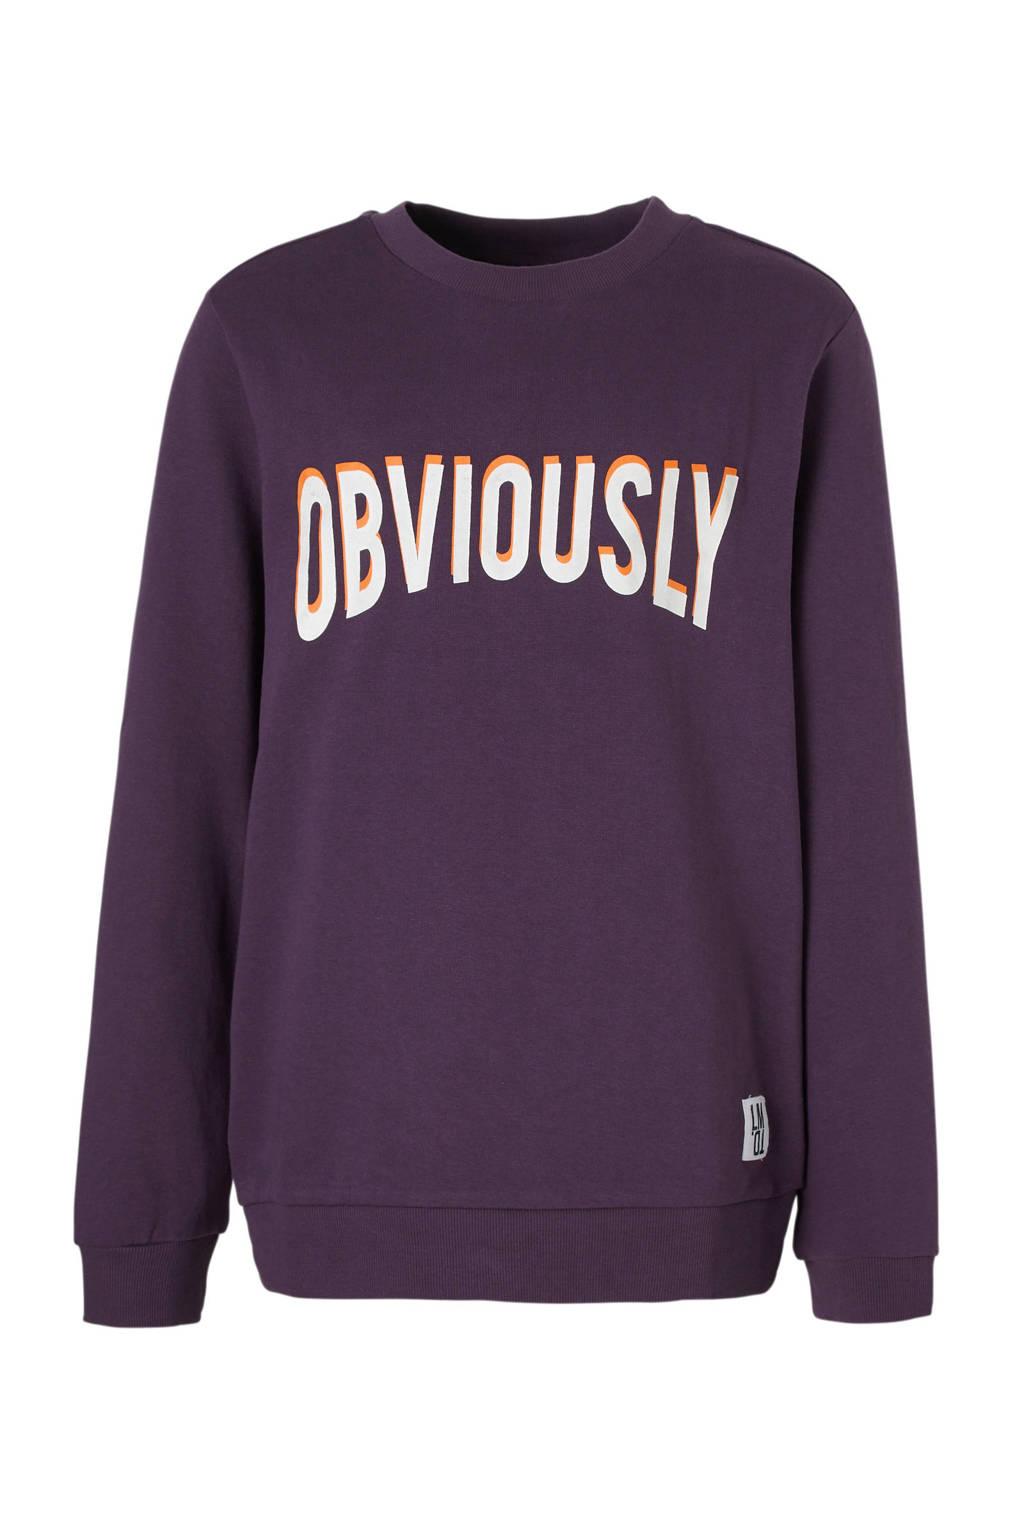 LMTD sweater Nester met tekst paars, Paars/wit/oranje